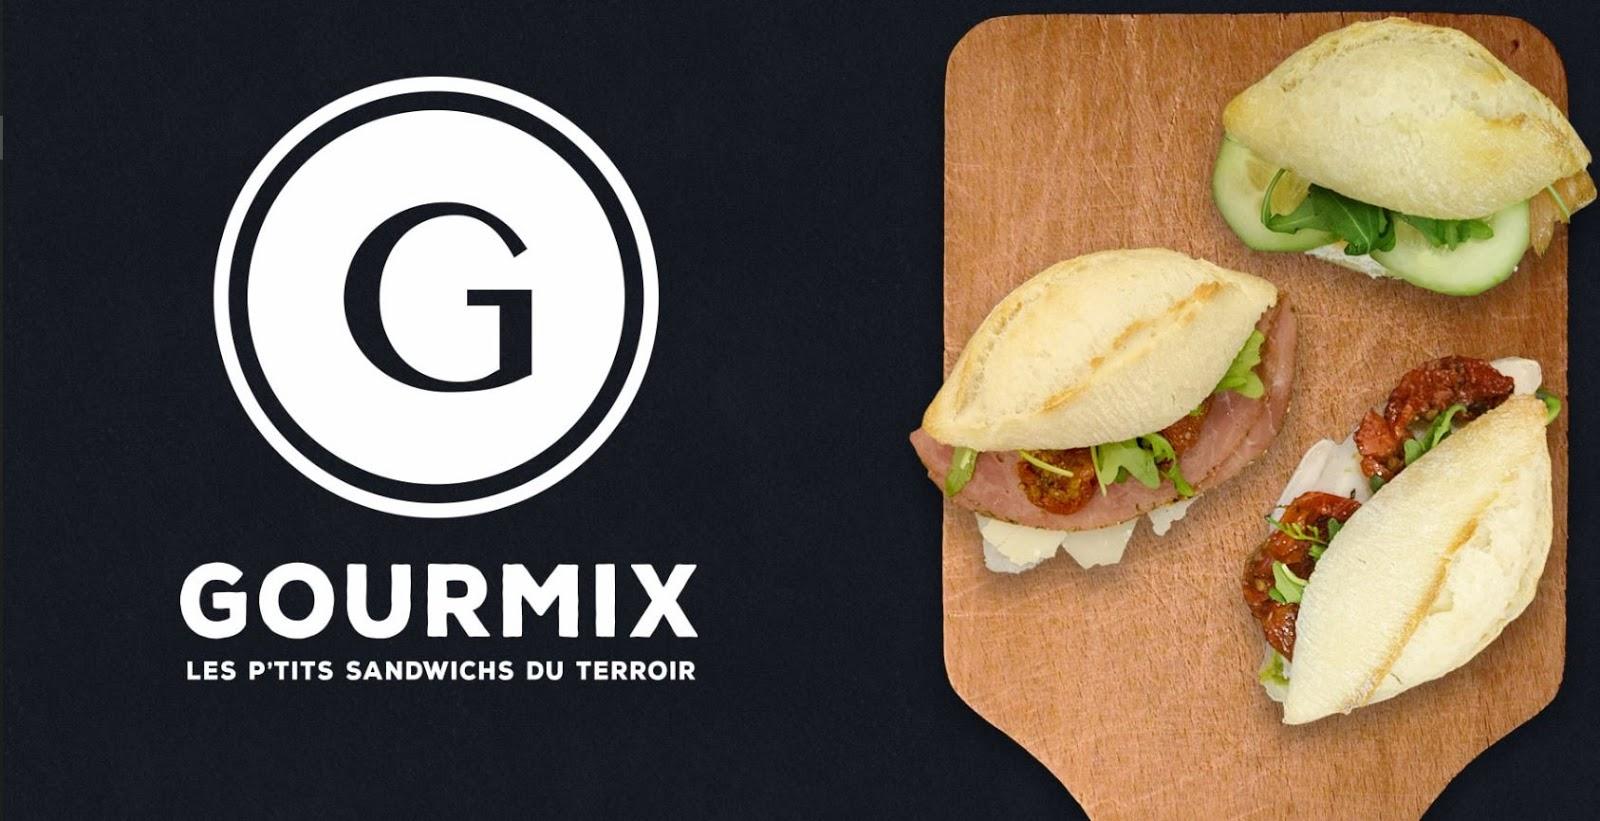 Gourmix Lyon